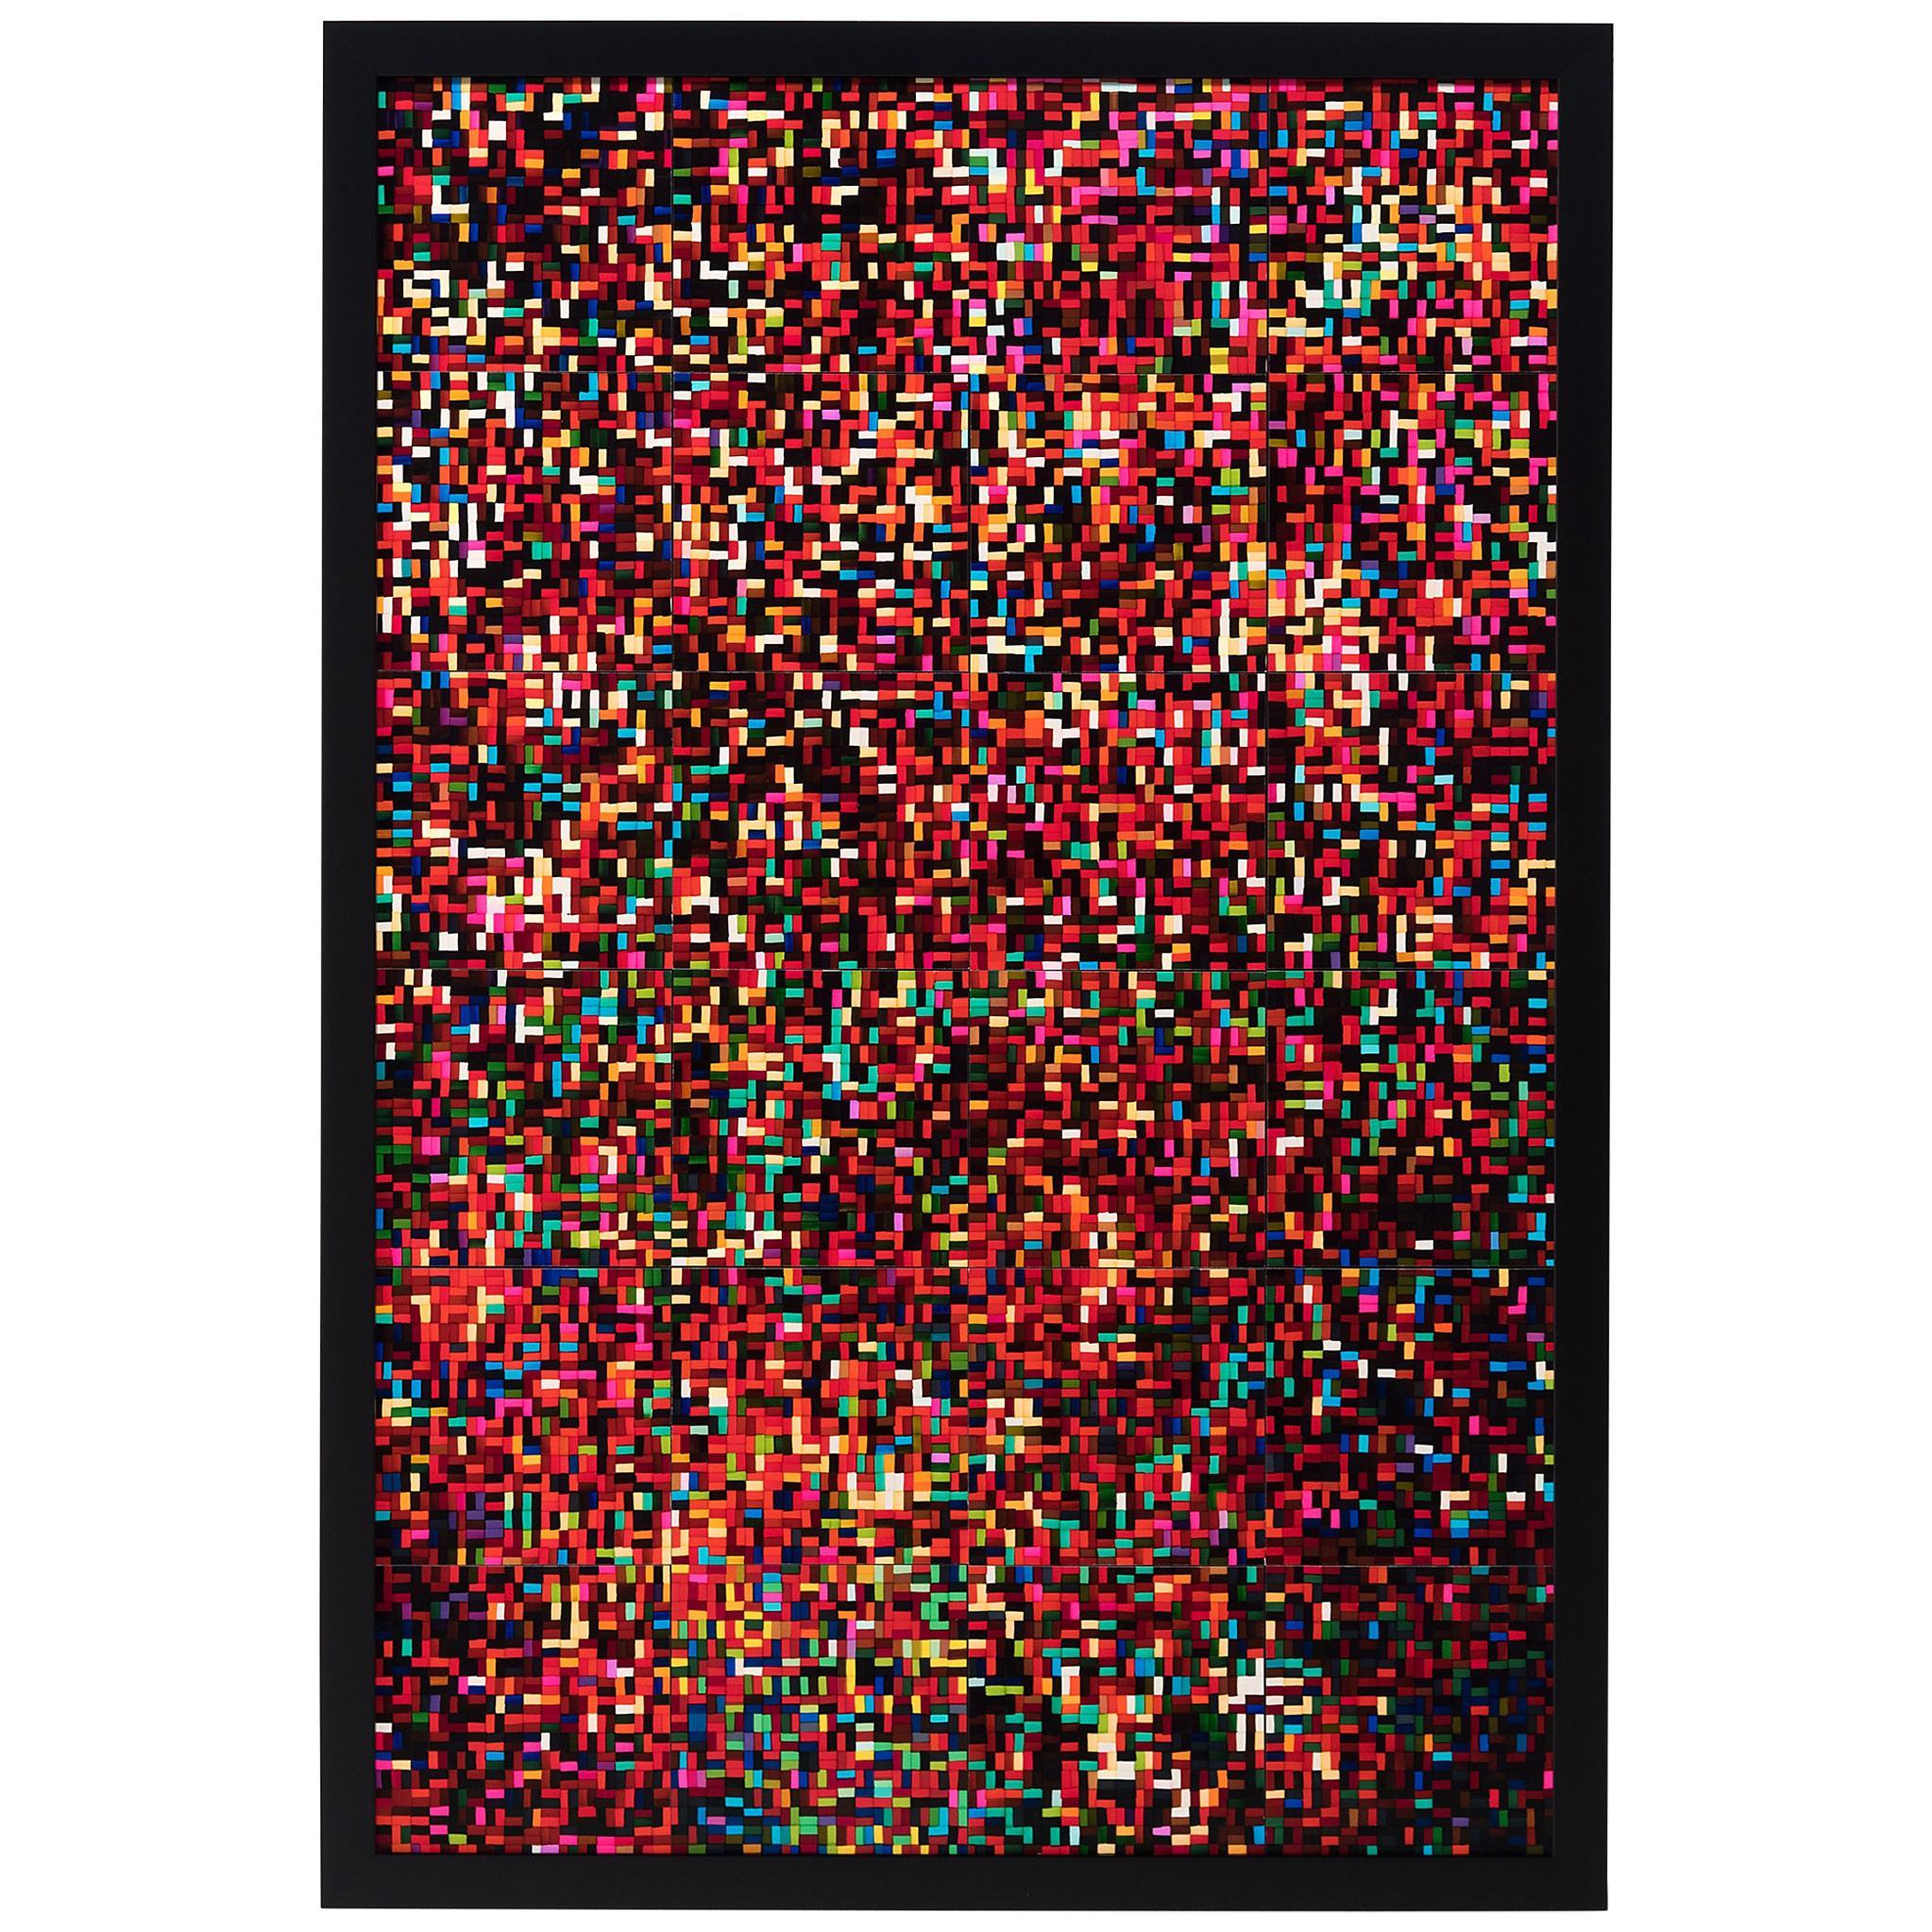 """Milky Way"" by Jan Pieter Fokkens"